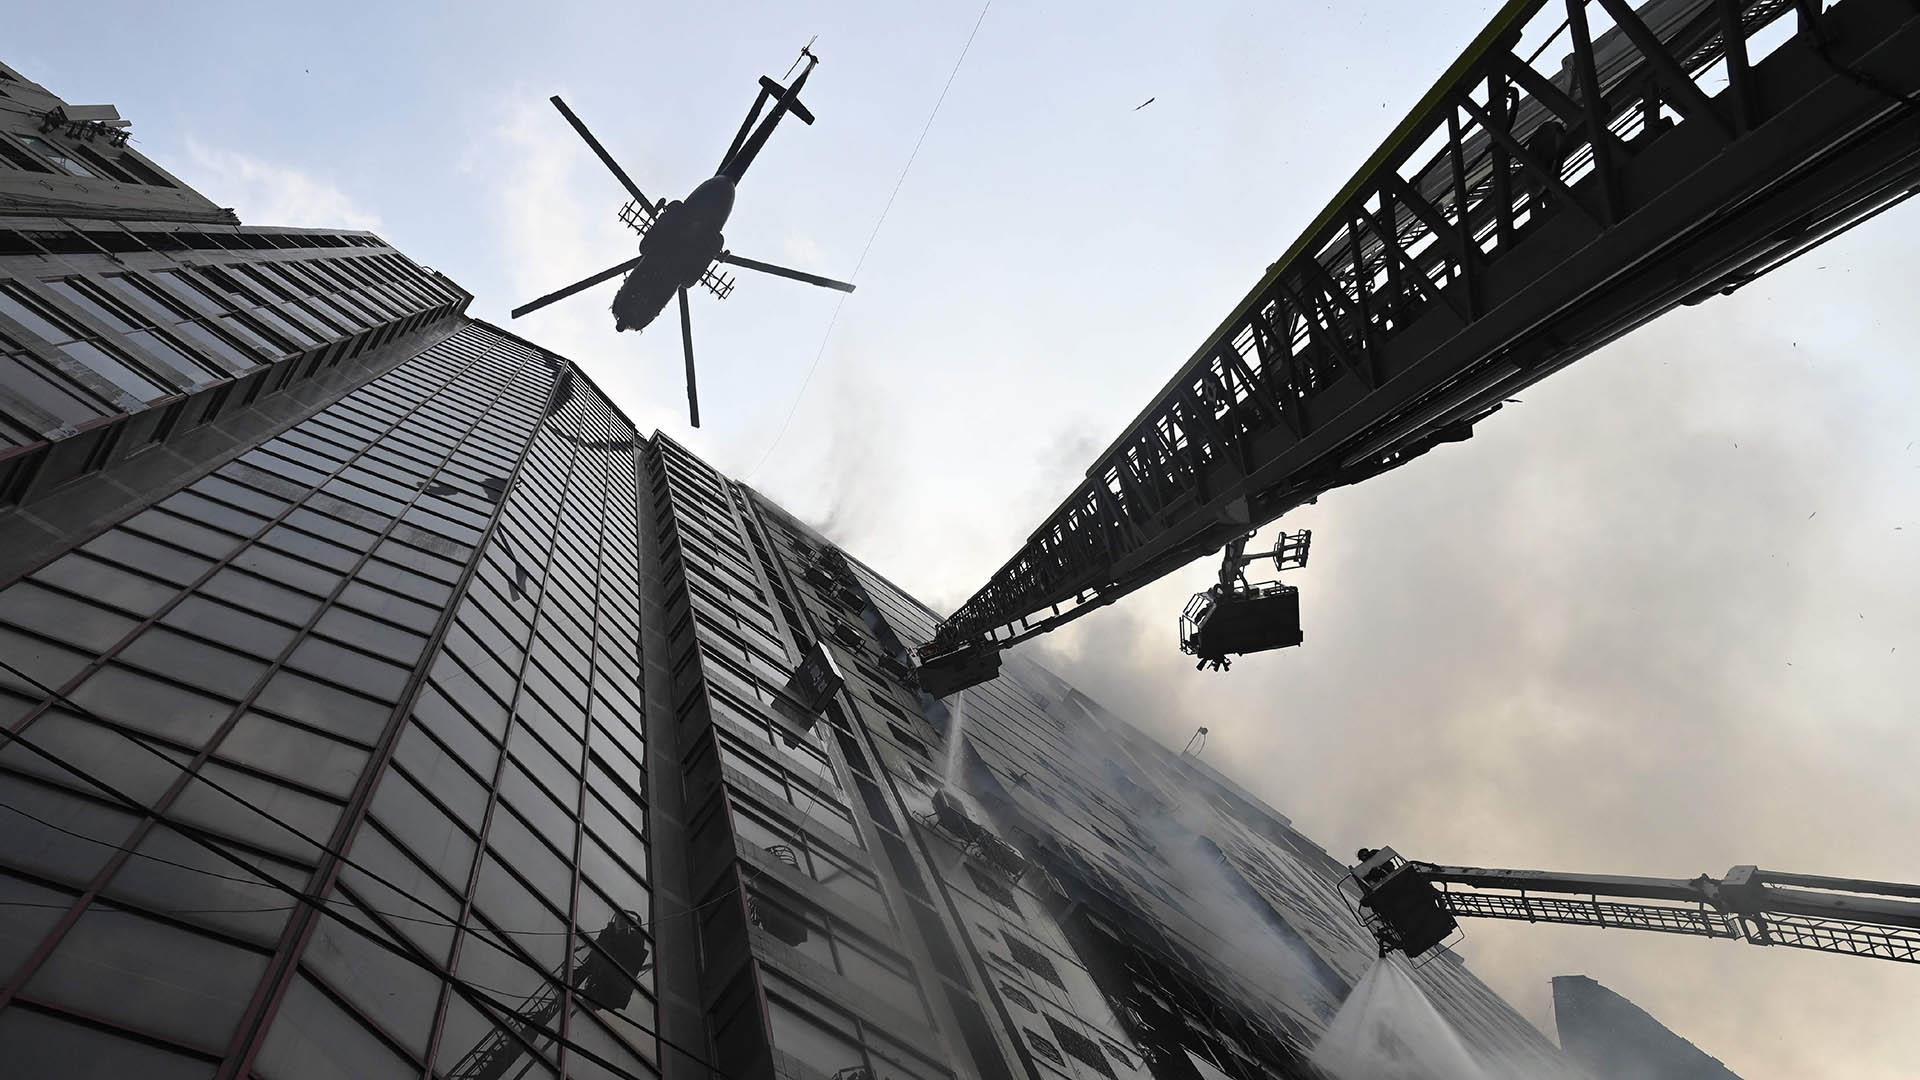 Bangladesh high-rise office building fire leaves more than a dozen dead